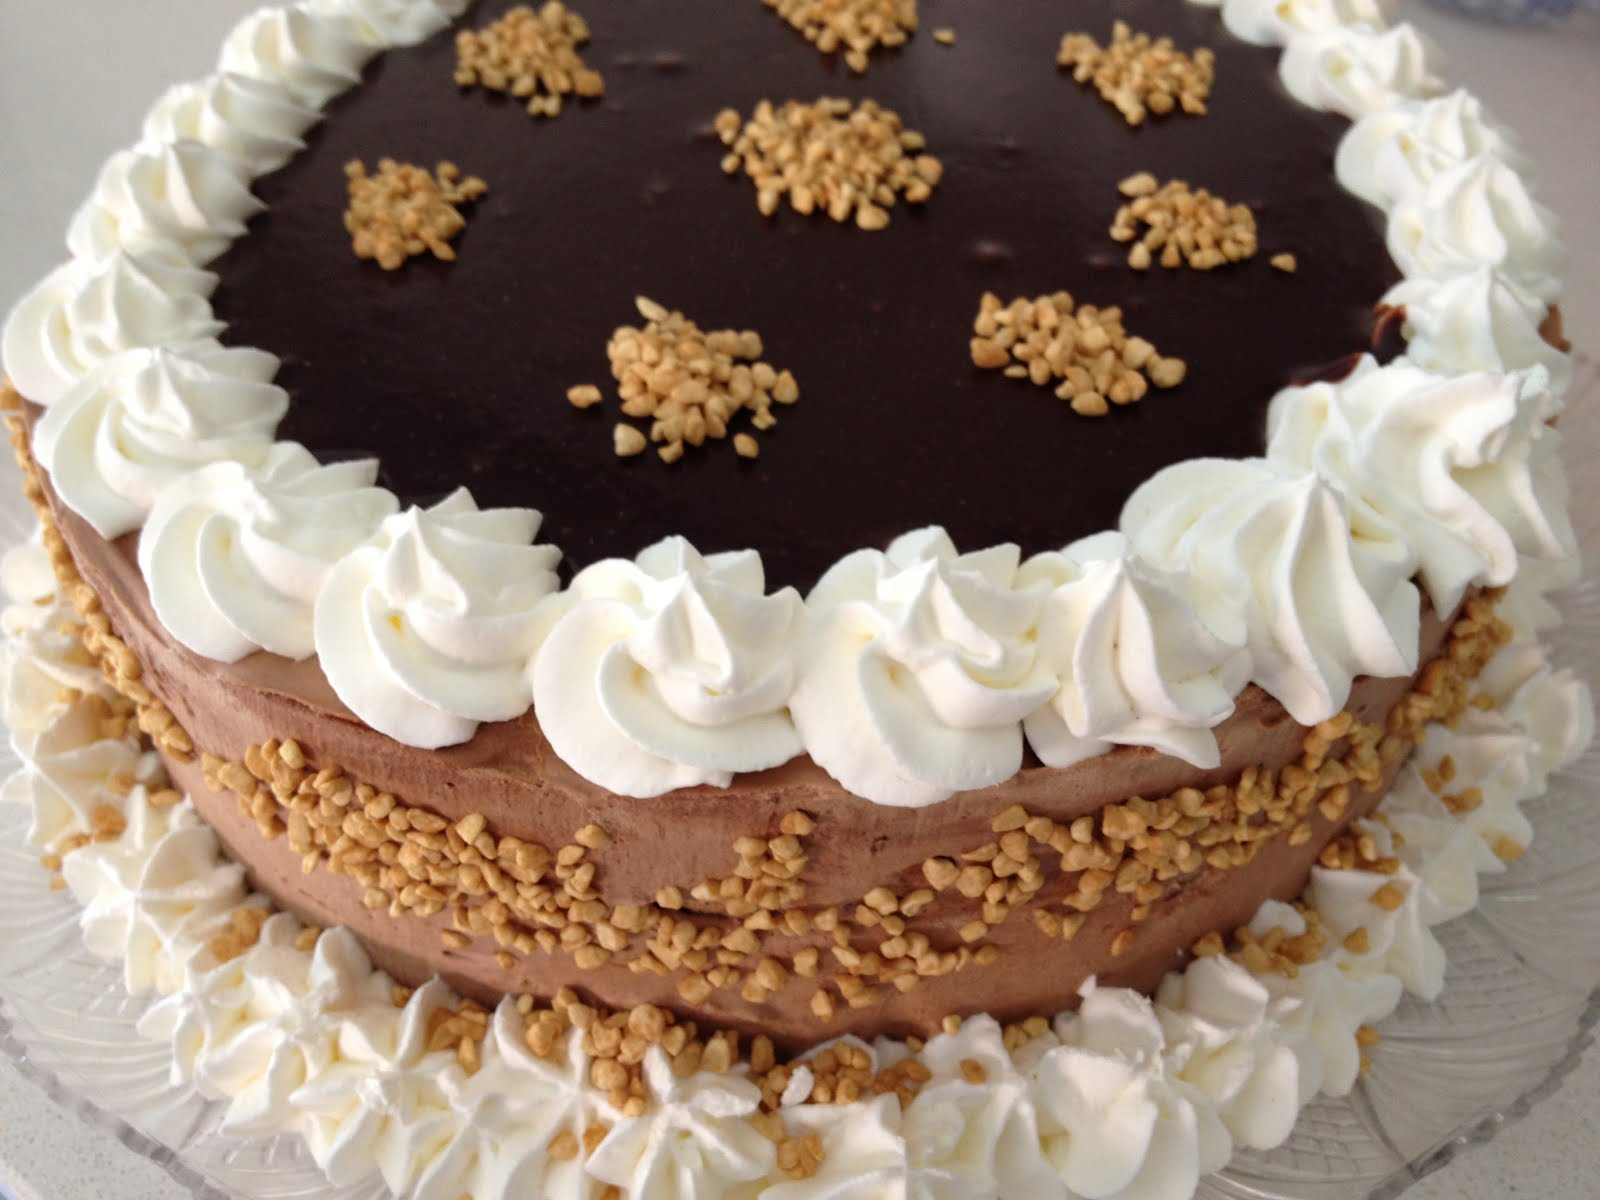 Bavarese cioccolato fondente noci nocciole panna montata